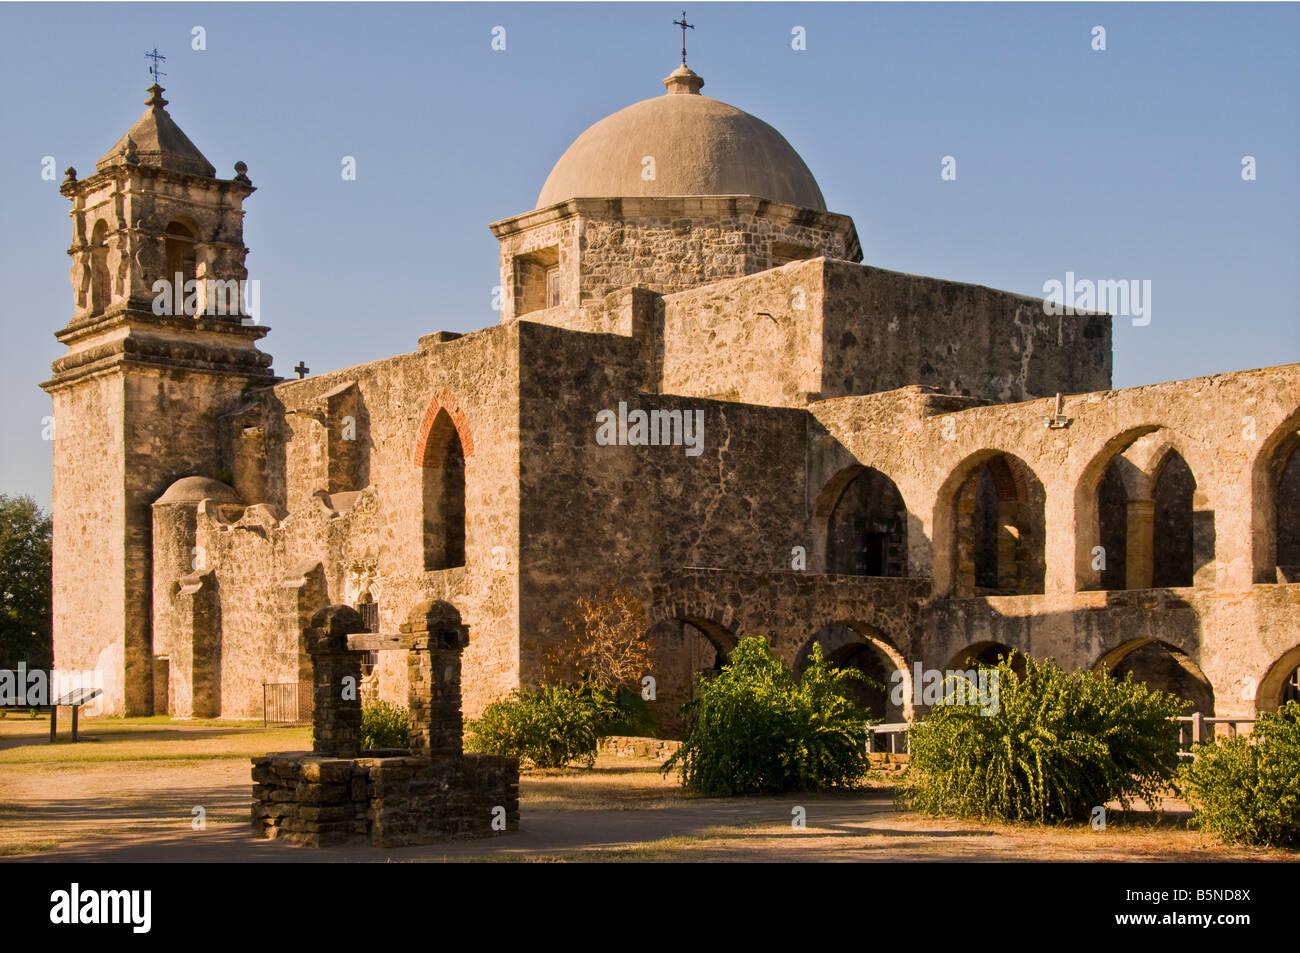 Mission San Jose, San Antonio, Texas. - Stock Image